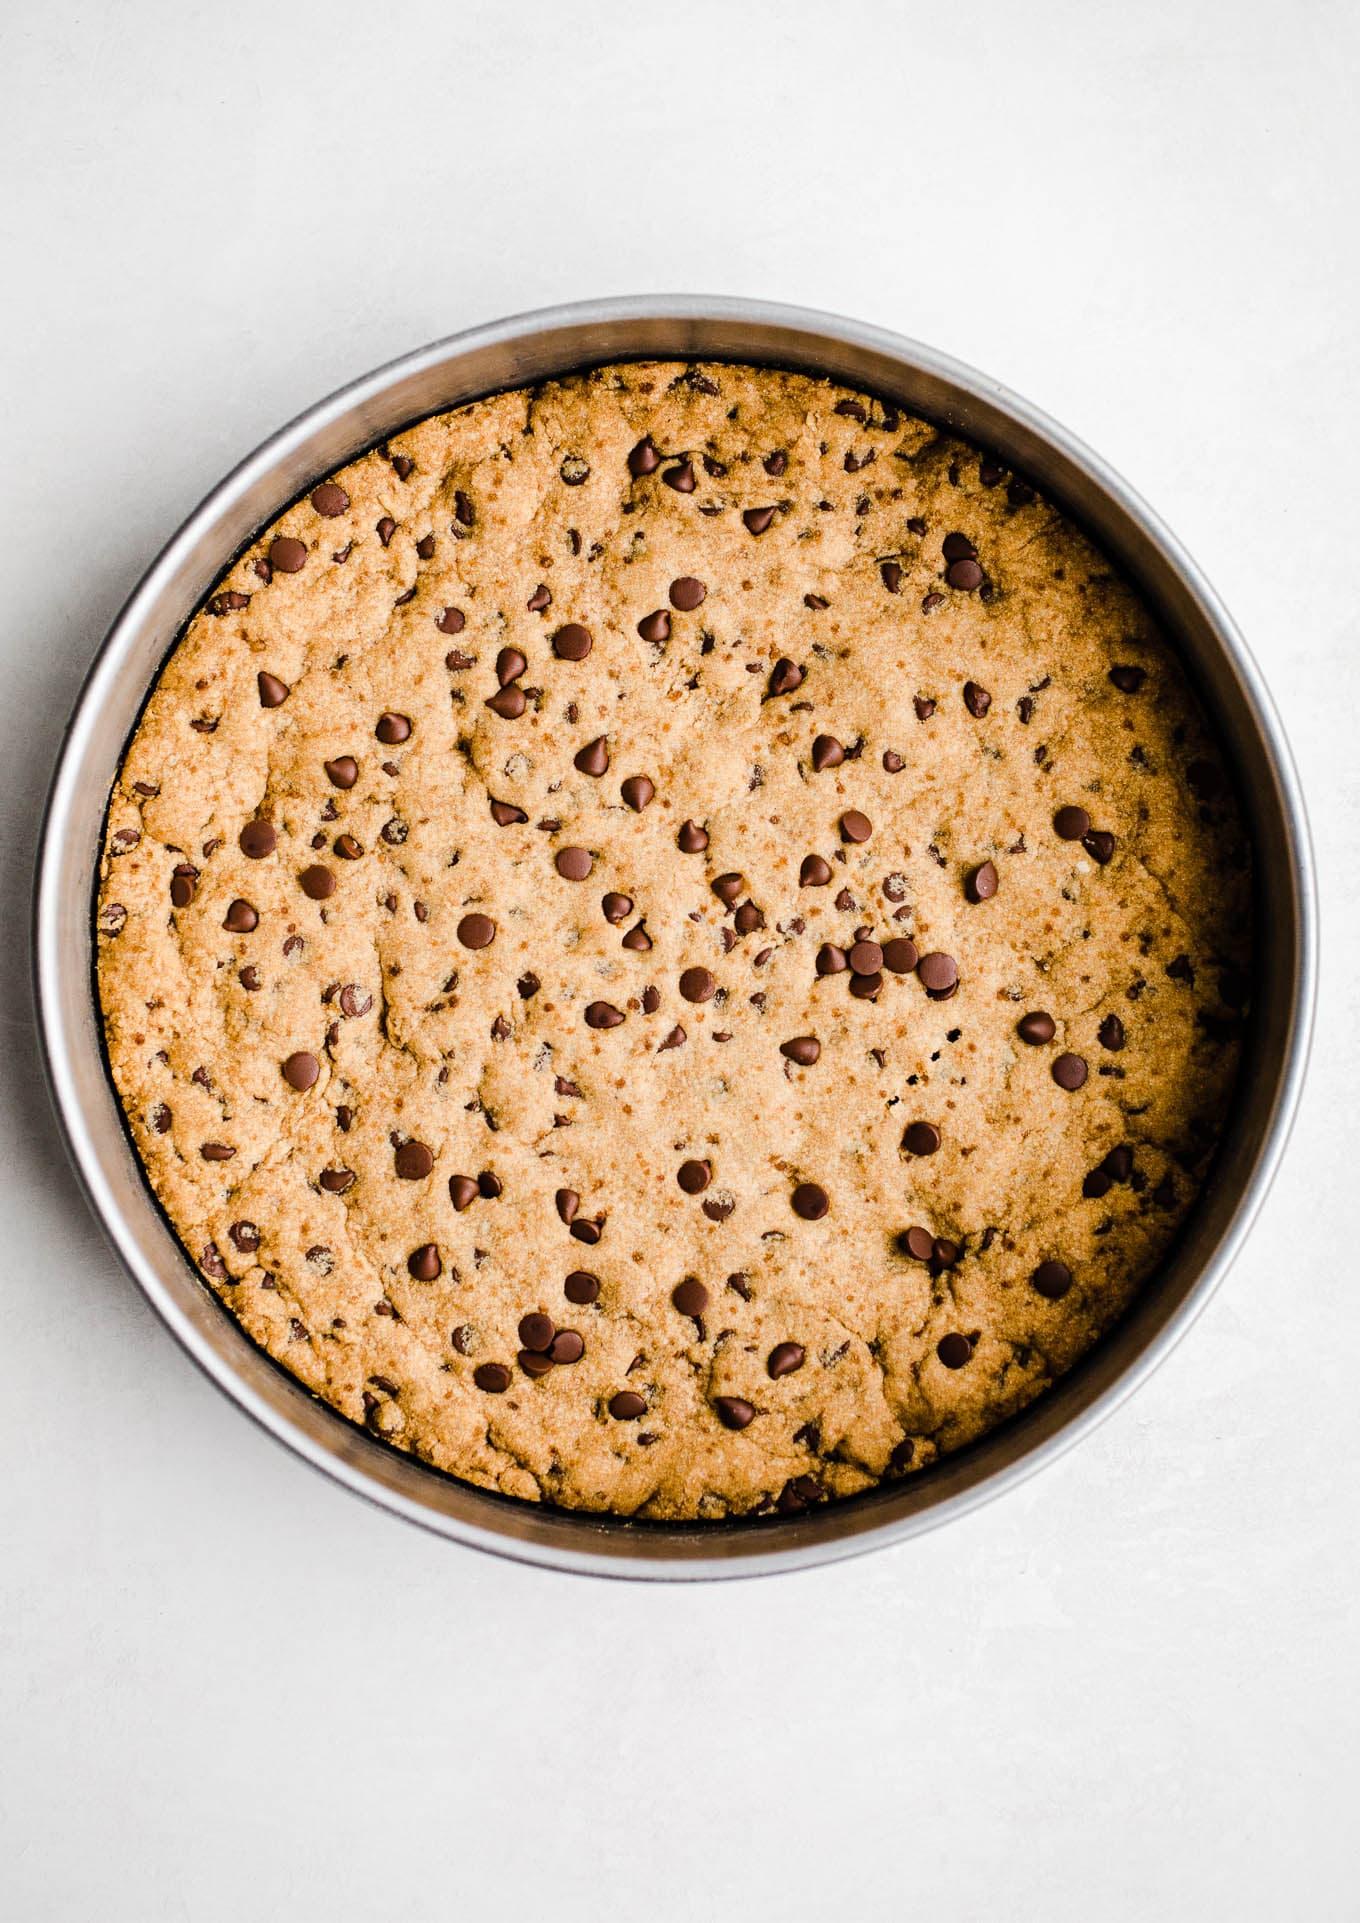 gluten-free cookie cake in pan